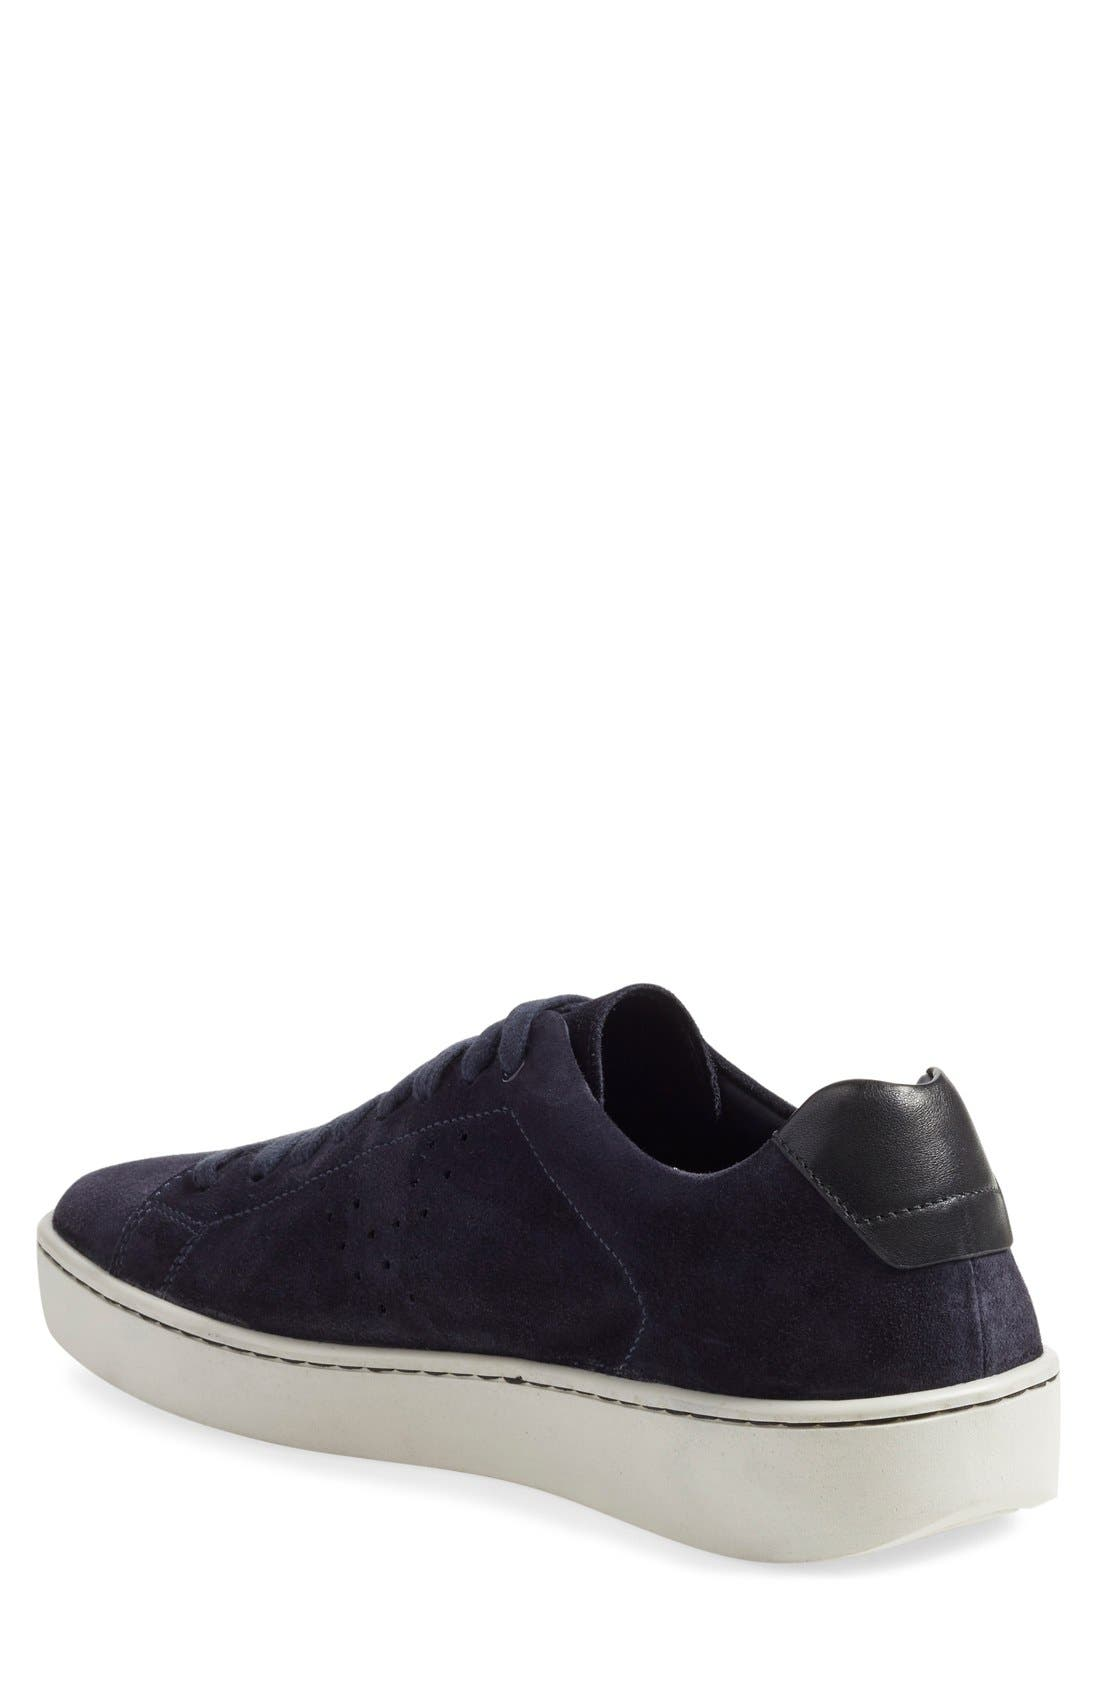 'Simon' Perforated Sneaker,                             Alternate thumbnail 4, color,                             407